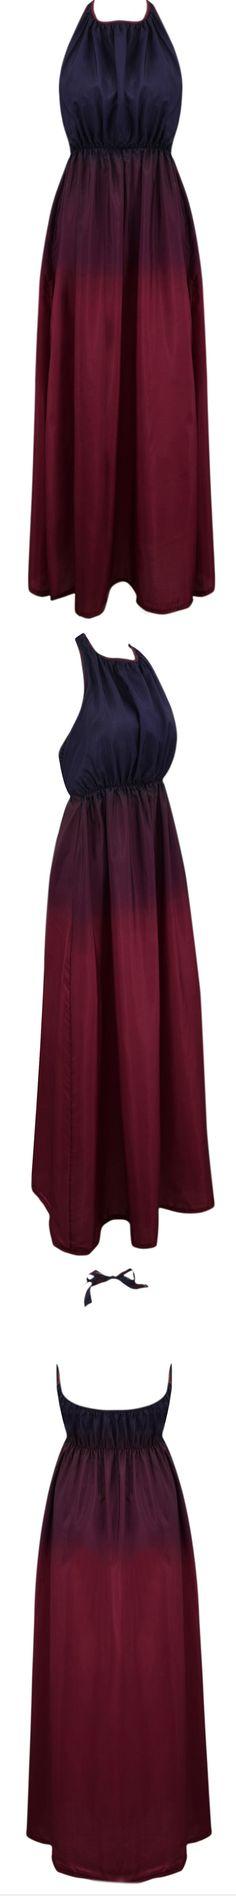 Azbro's Gradient Ramp High Slit Pleated Maxi Chiffon Halter Dress